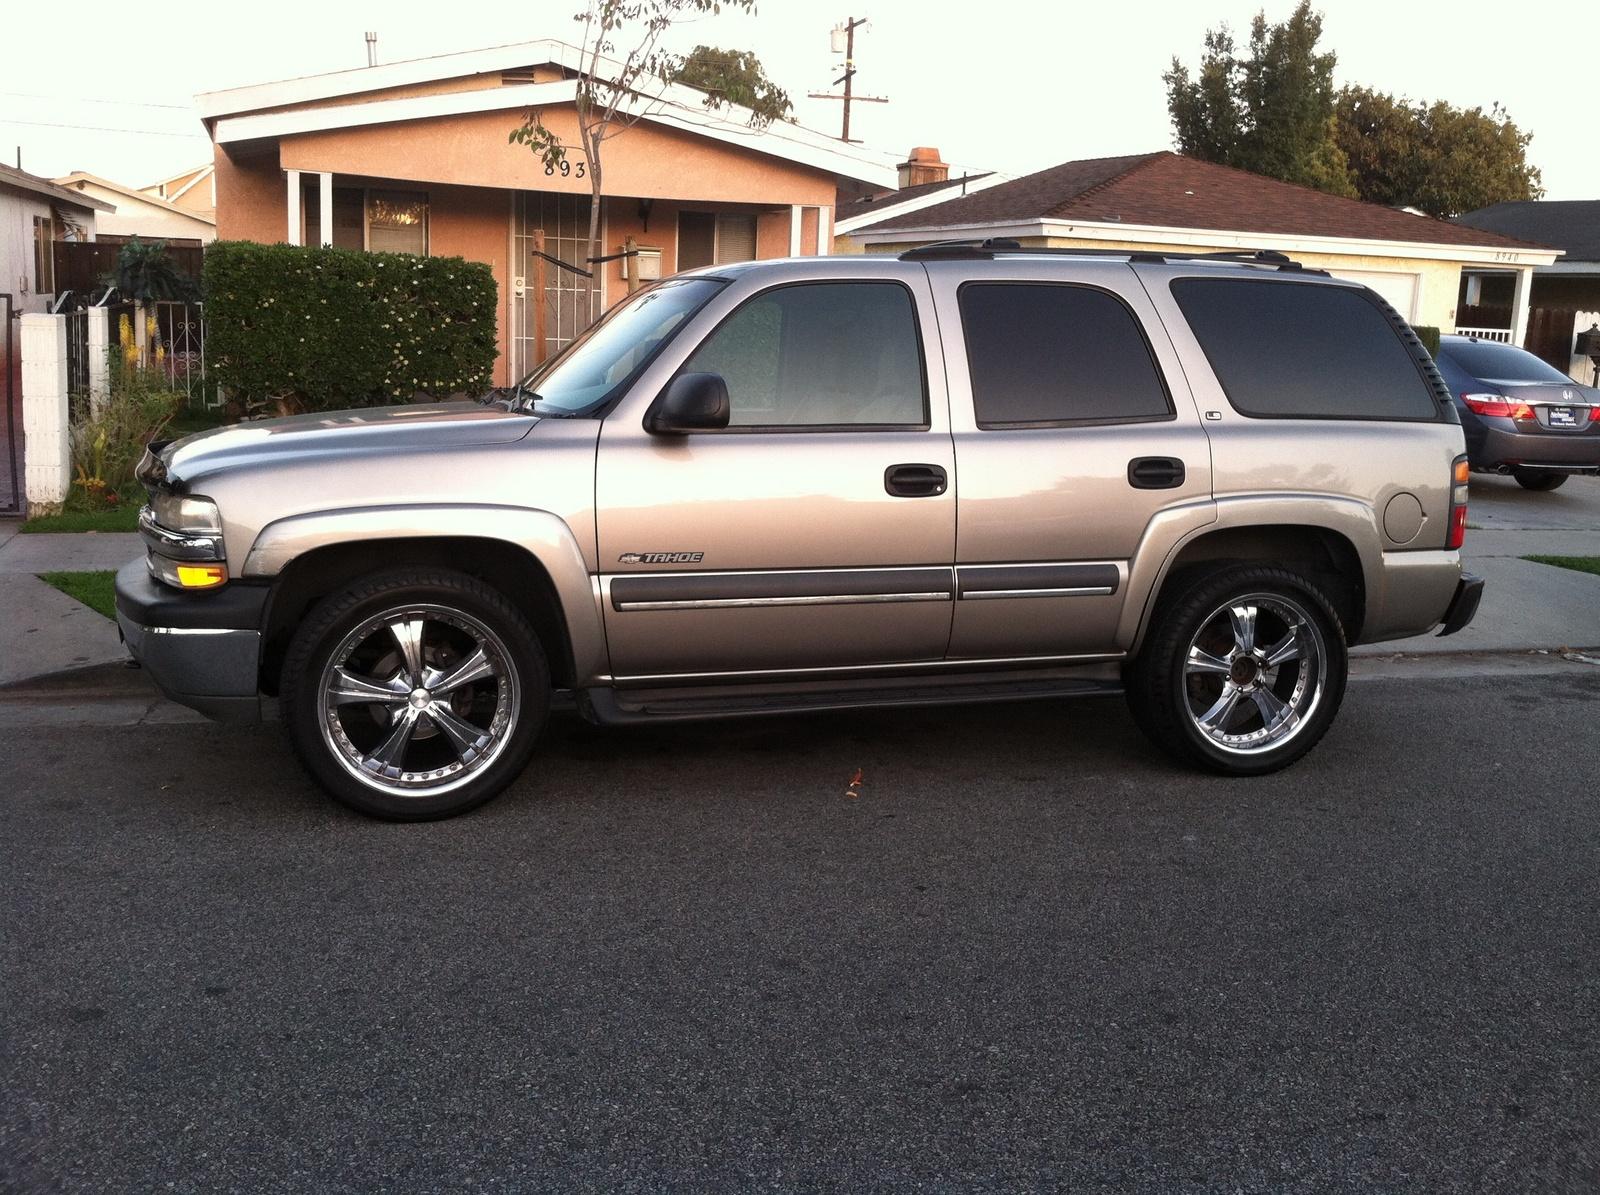 1996 chevy suburban